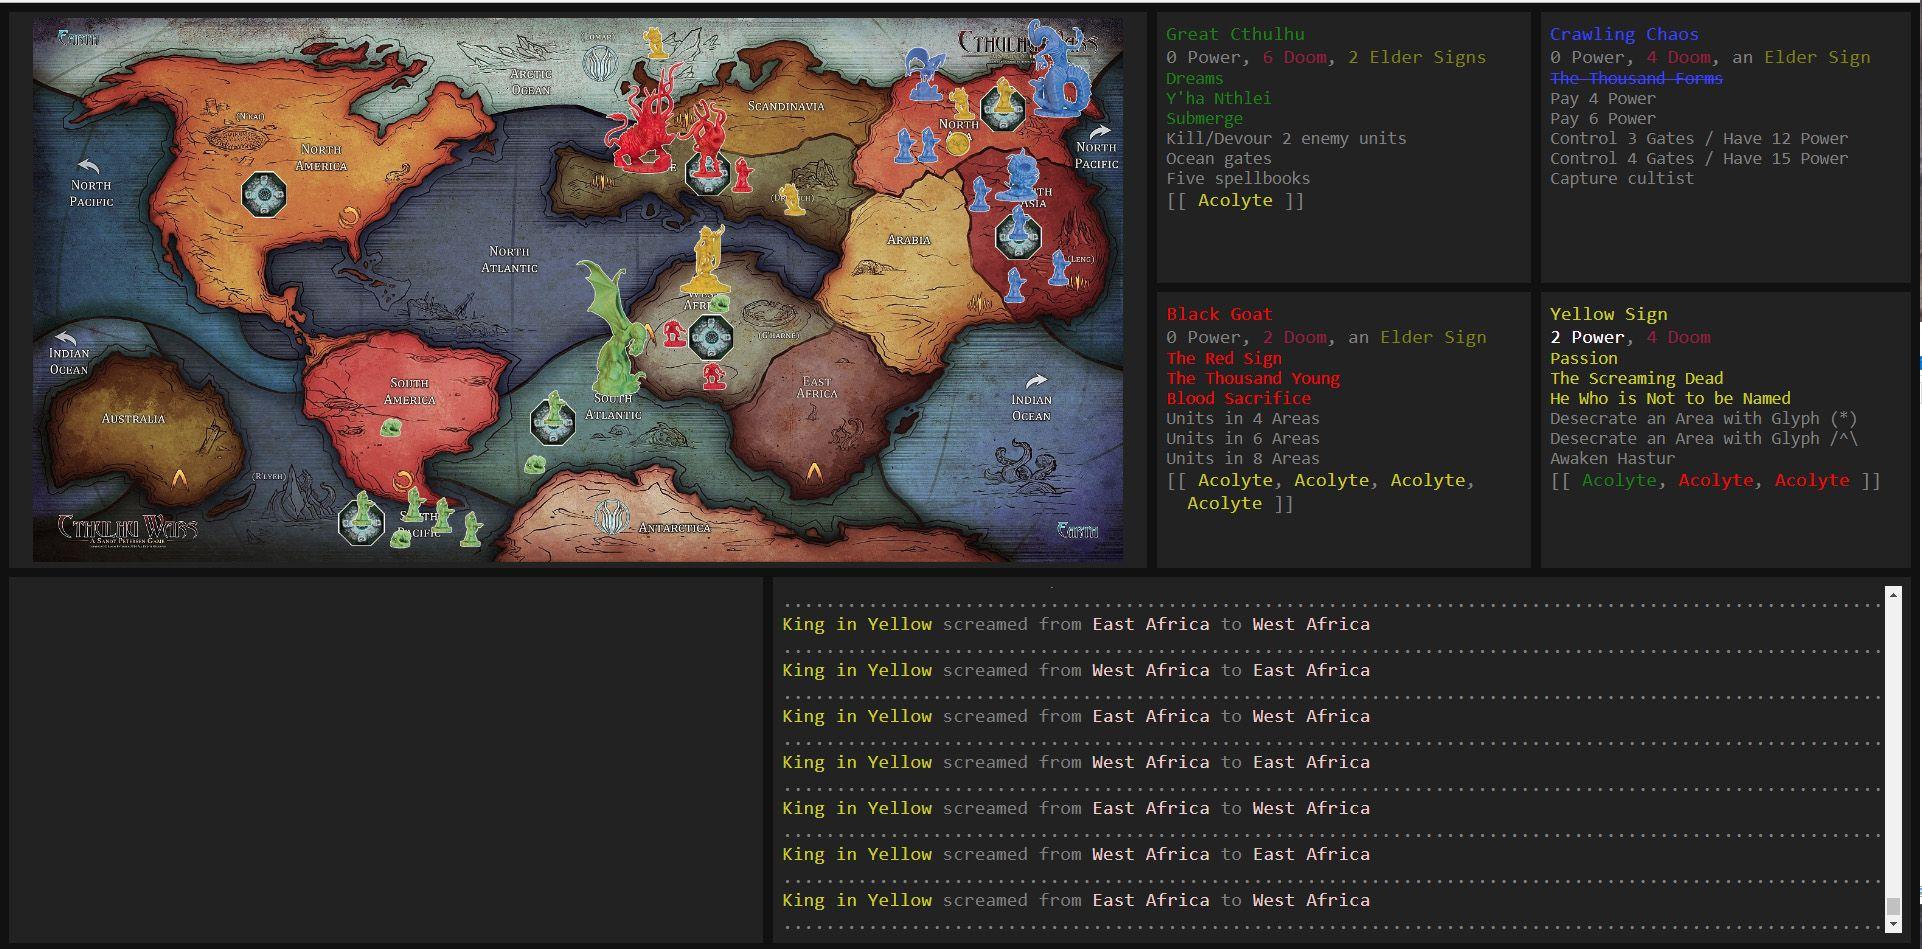 Cthulhu Wars Solo HRF 1 3 | Cthulhu Wars | BoardGameGeek